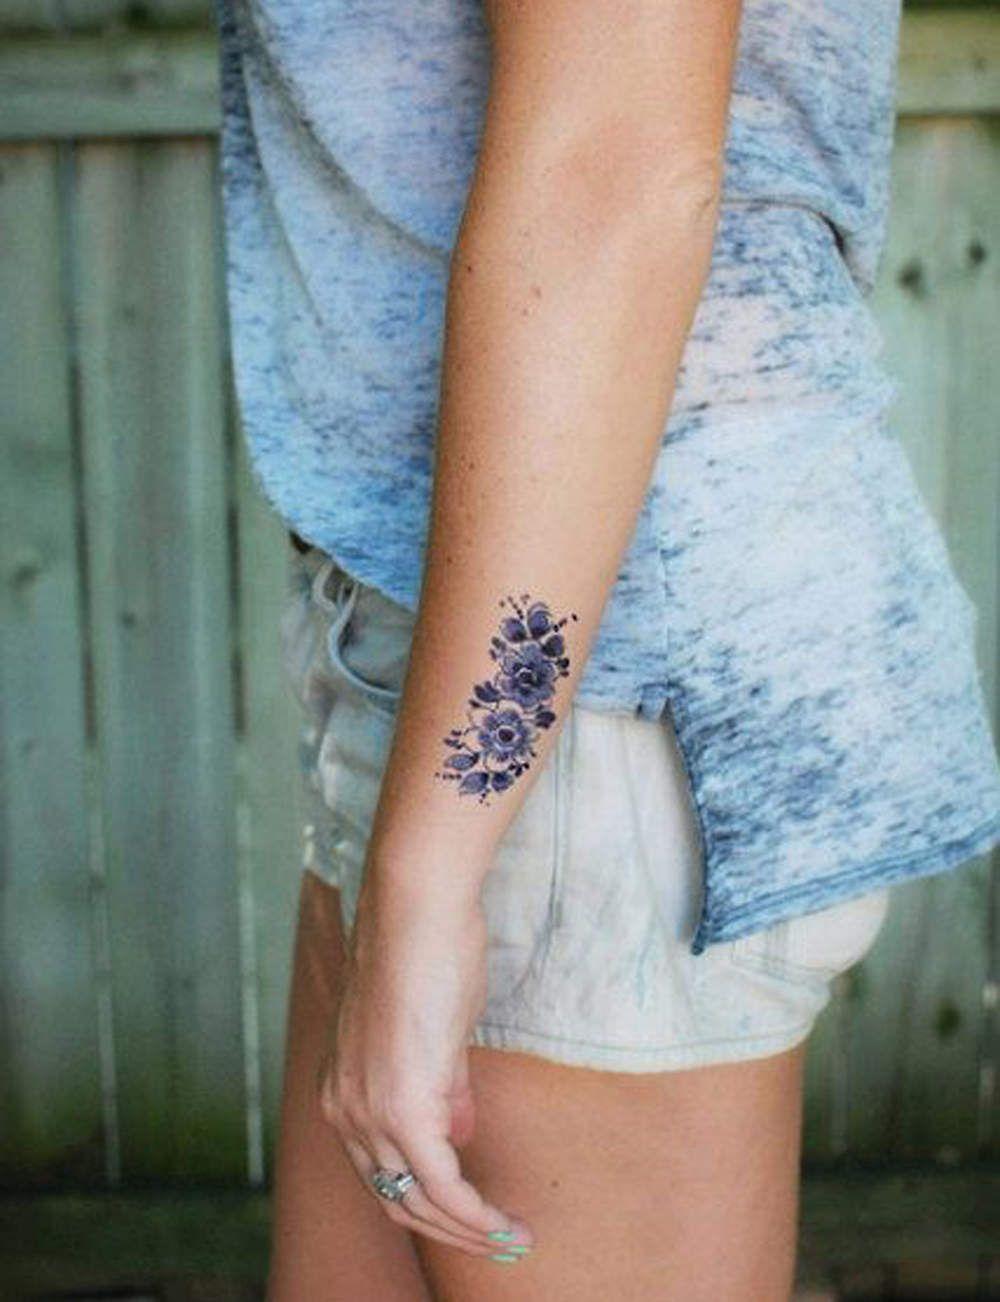 Tatouage Je M Y Mets Ou Pas Tattoos Pinterest Tatouage